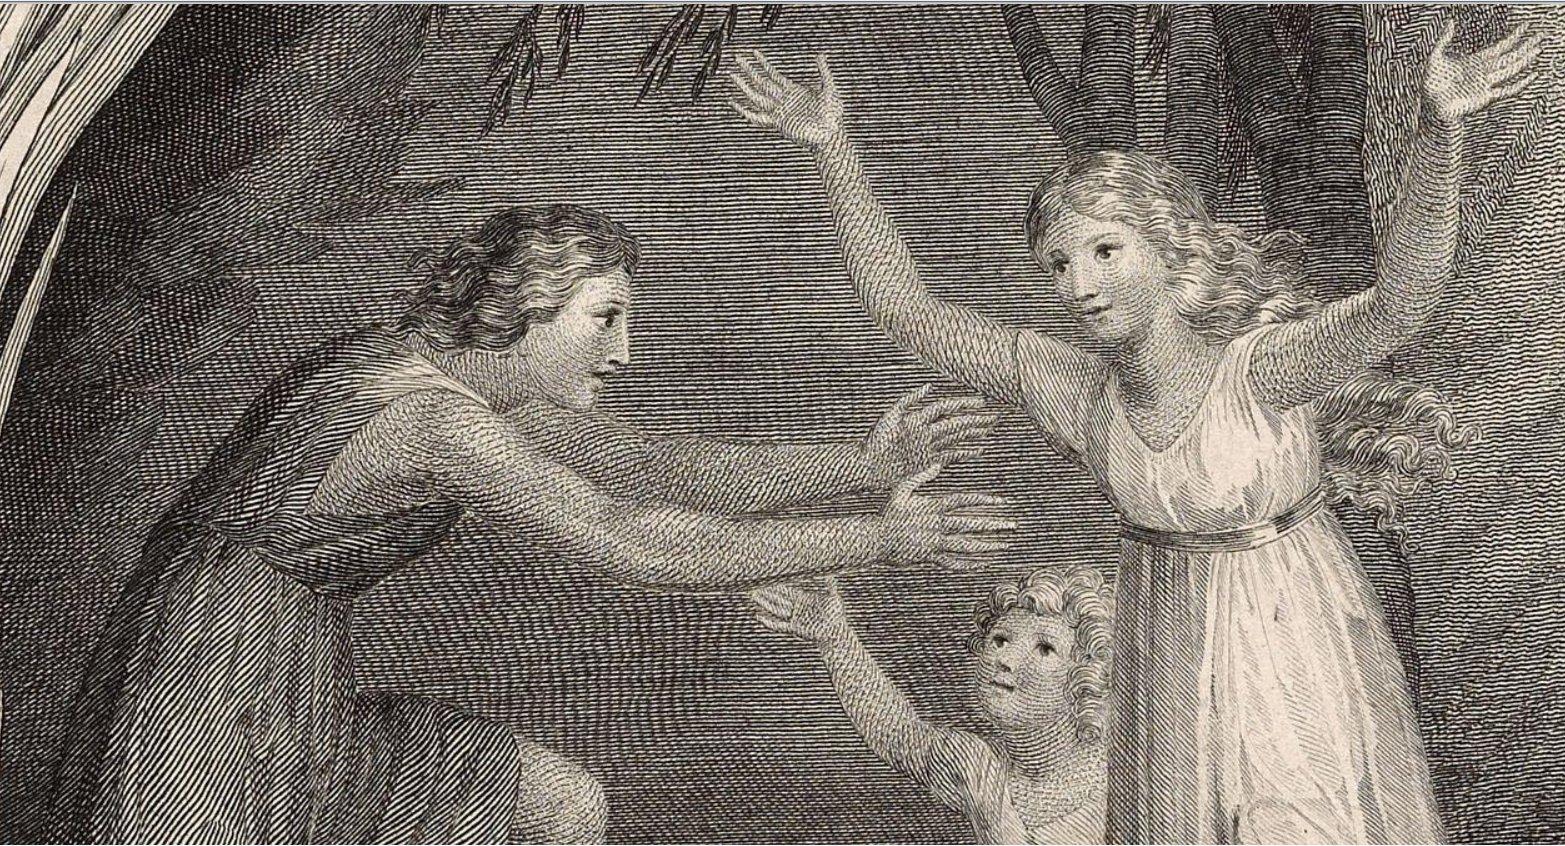 William_Blake_An_Elegy_Set_to_Music_by_Thomas_Commins_J_Fentum_publ_Jul_1_1786_detail